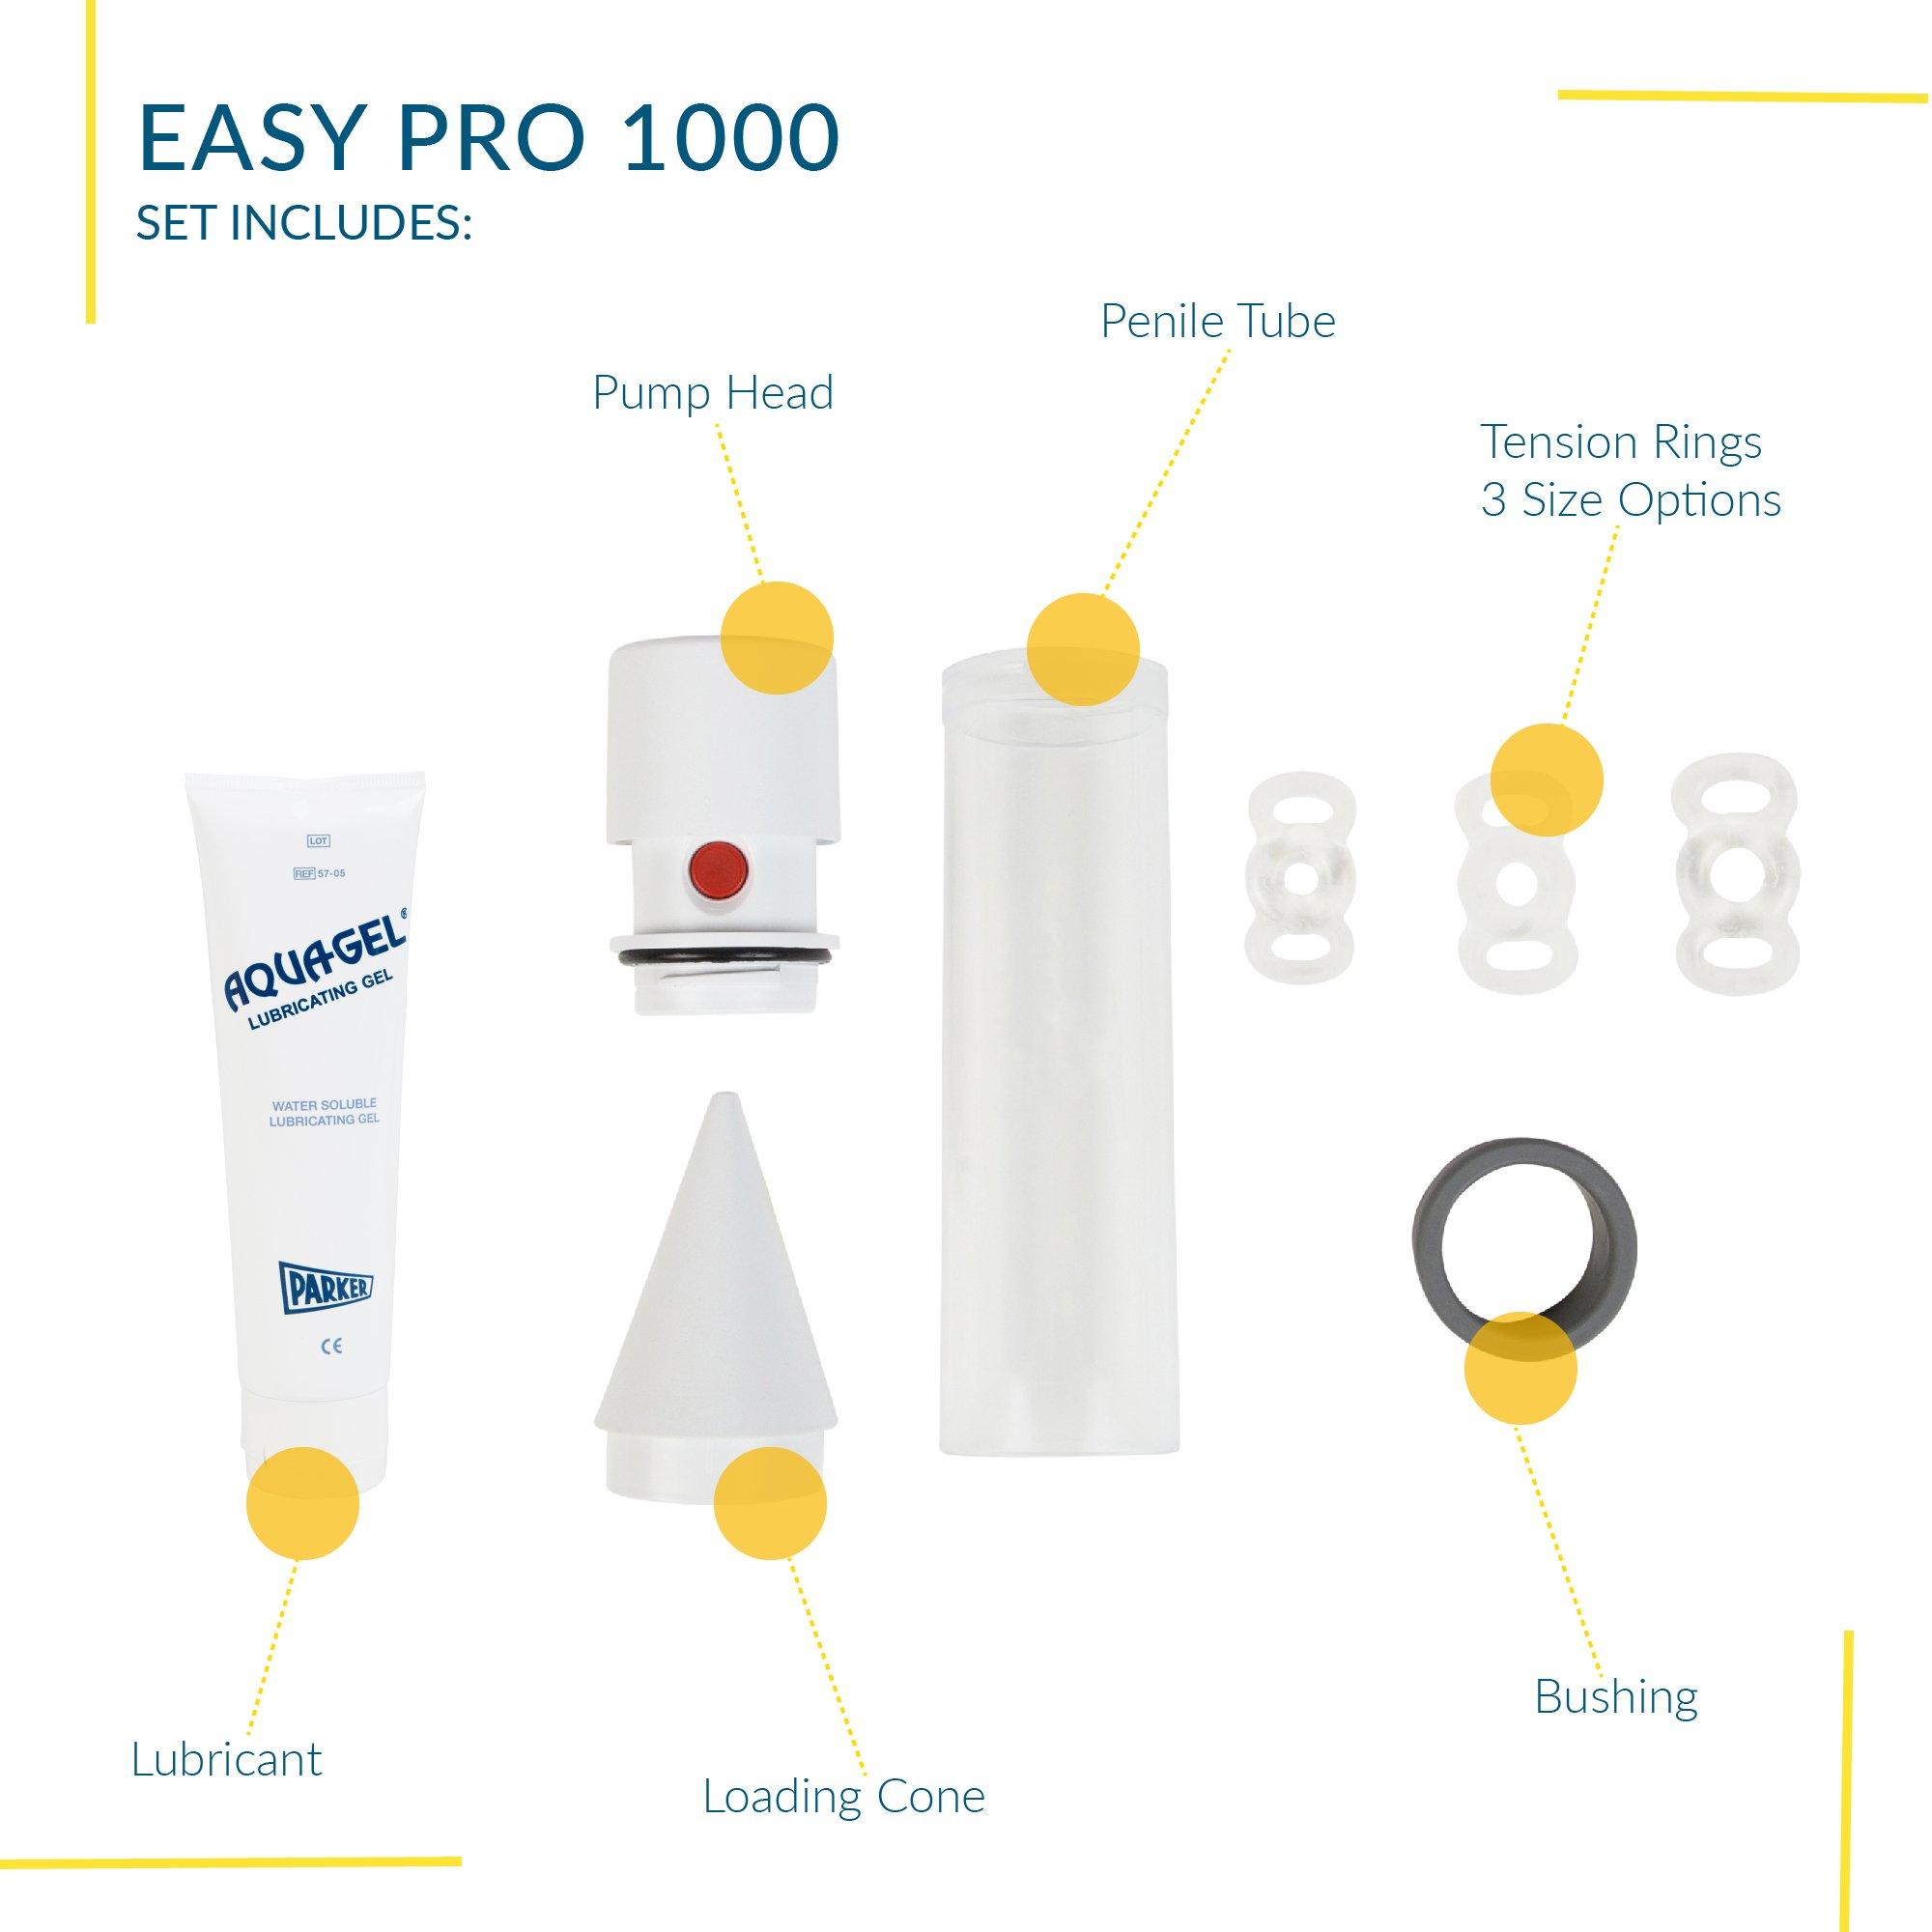 Vacuum Pump for Men, Natural Alternative to Erectile Dysfunction Pills, Manual Penis Pump, Men's Pump Kit for Erectile Dysfunction - Pos-T-Vac, Easy Pro 1000 by POS-T-VAC (Image #3)